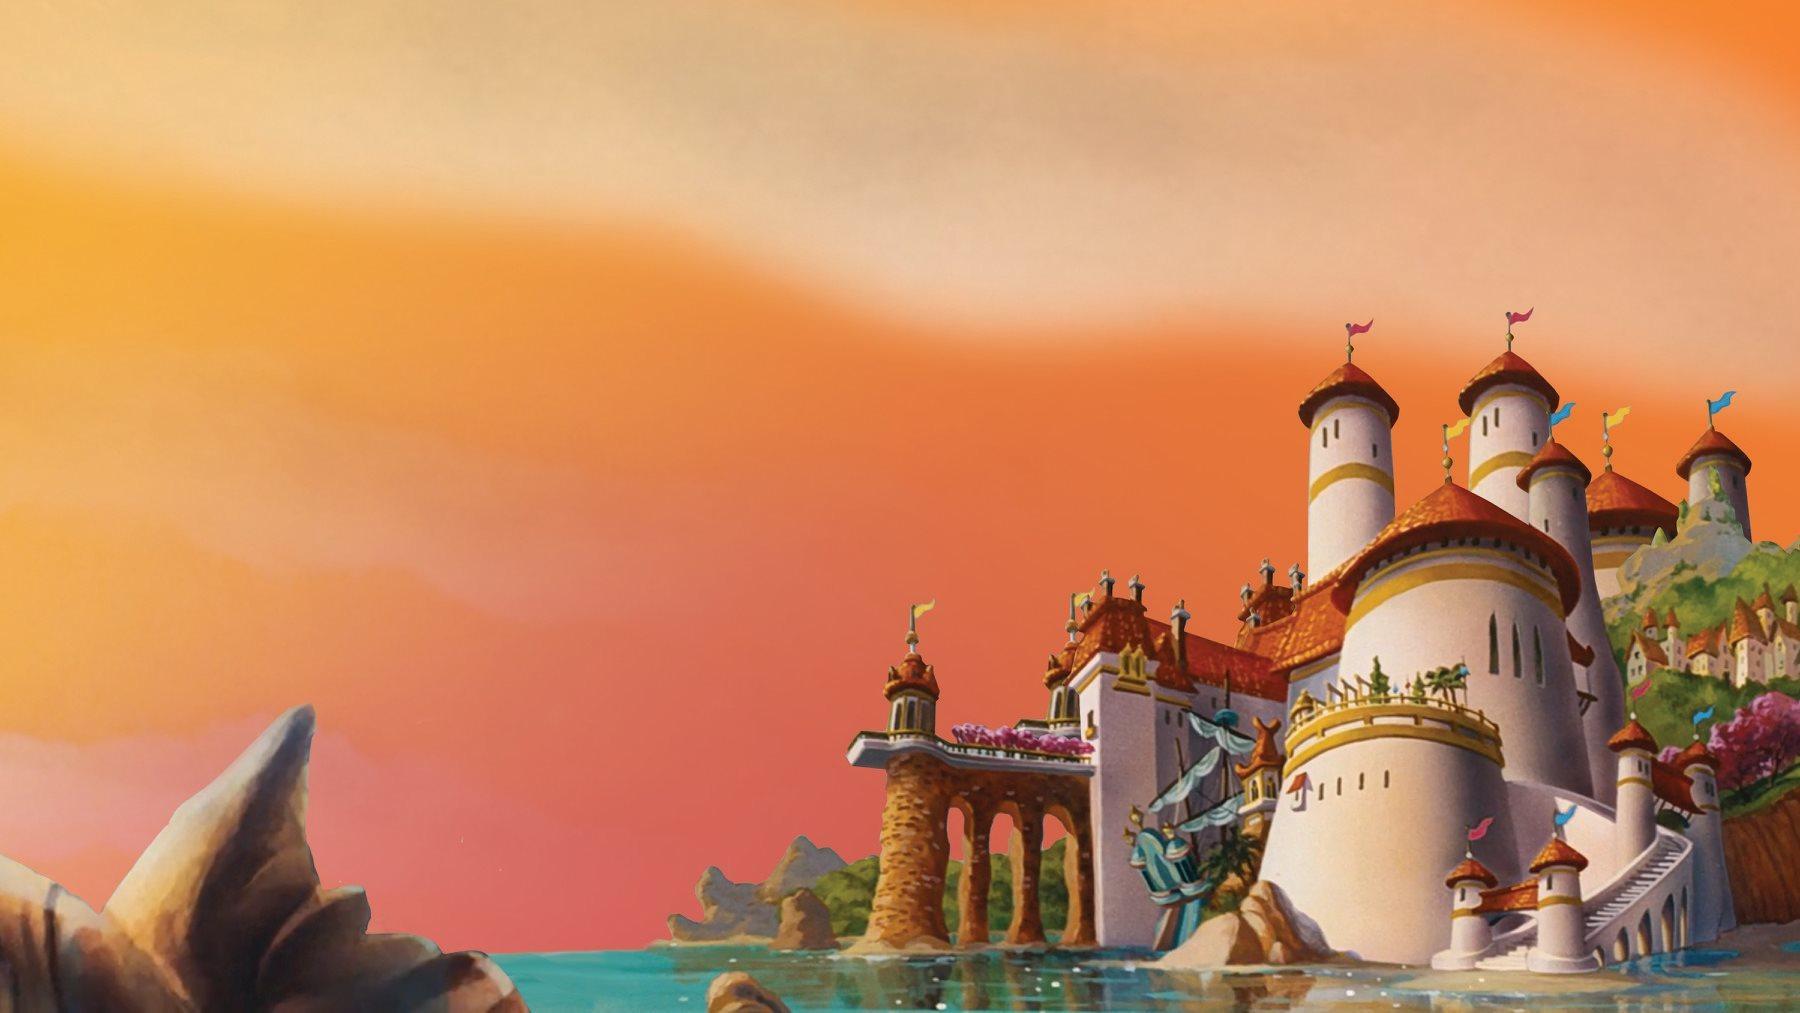 the little mermaid castle